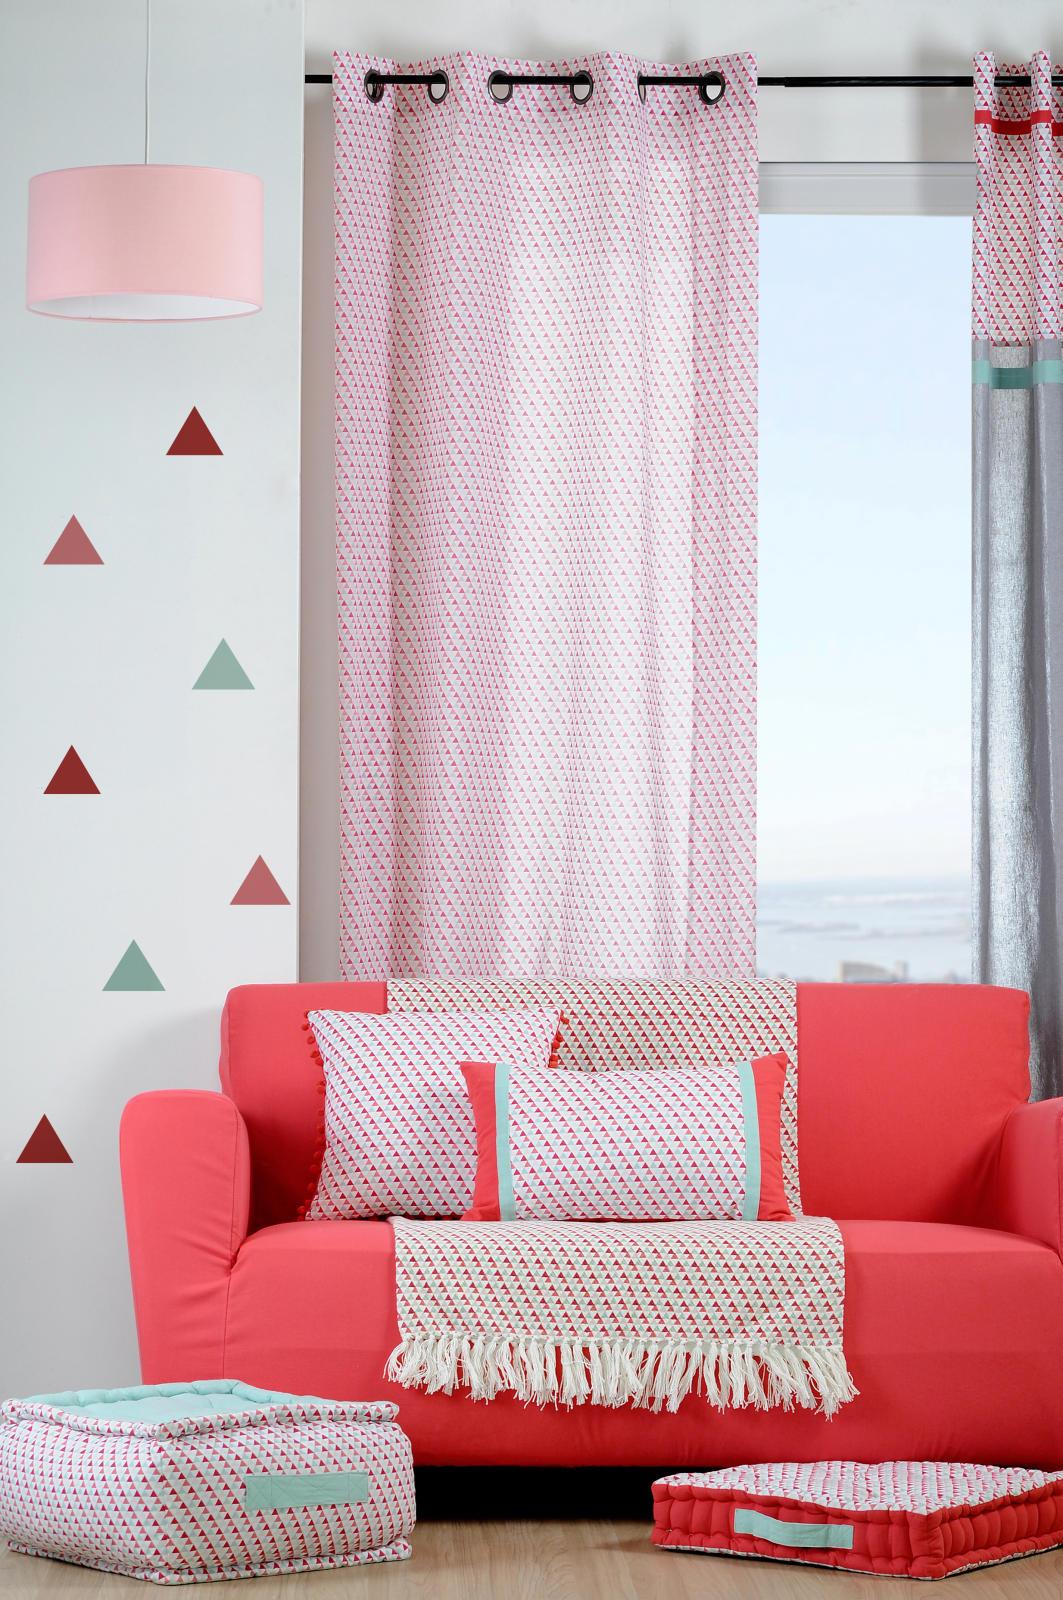 voilage avec imprim g om trique triangles rouge c ladon homemaison vente en ligne voilages. Black Bedroom Furniture Sets. Home Design Ideas